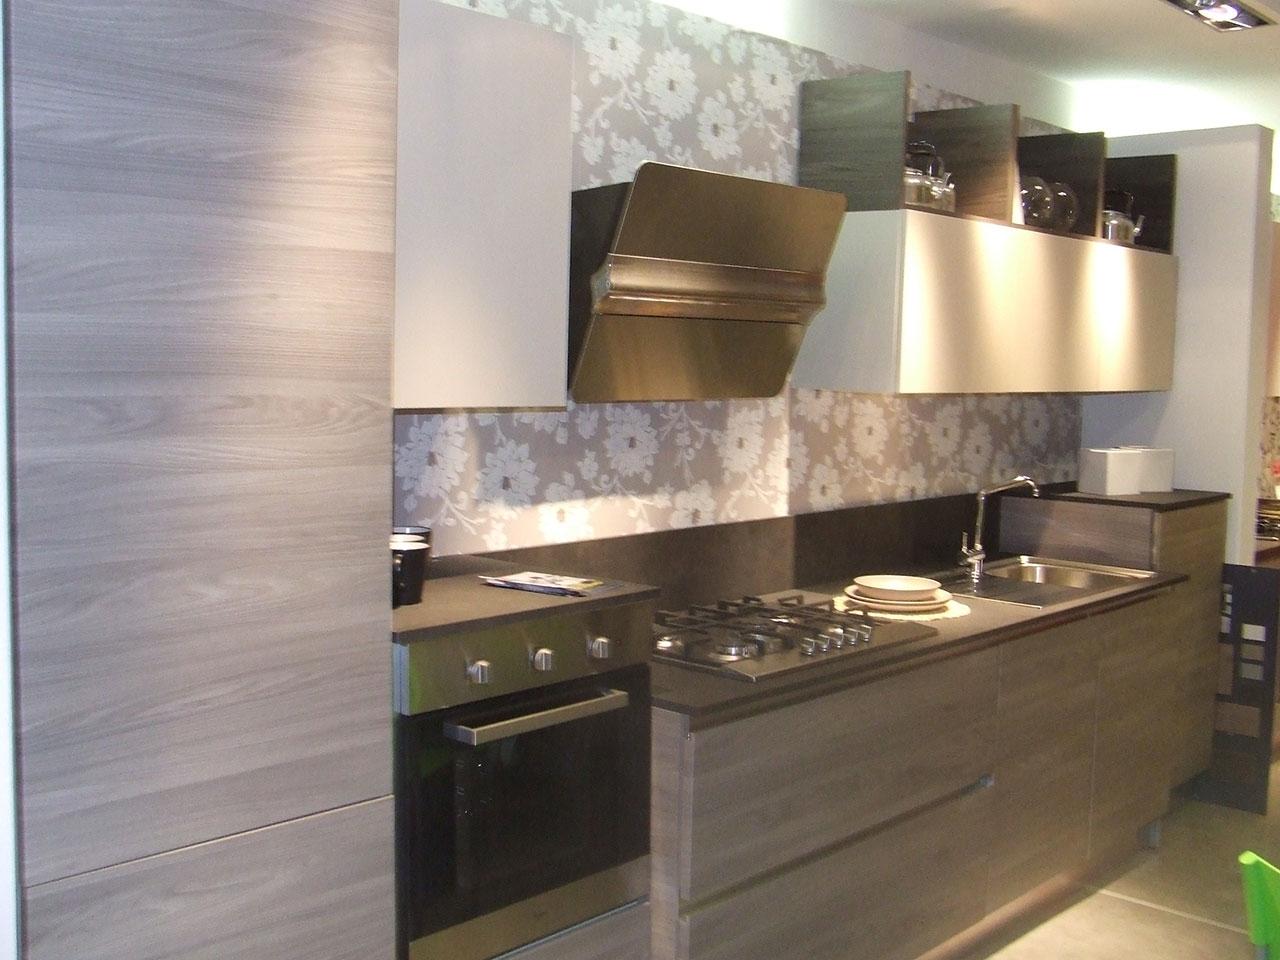 stunning arrex le cucine gallery design ideas 2017. Black Bedroom Furniture Sets. Home Design Ideas